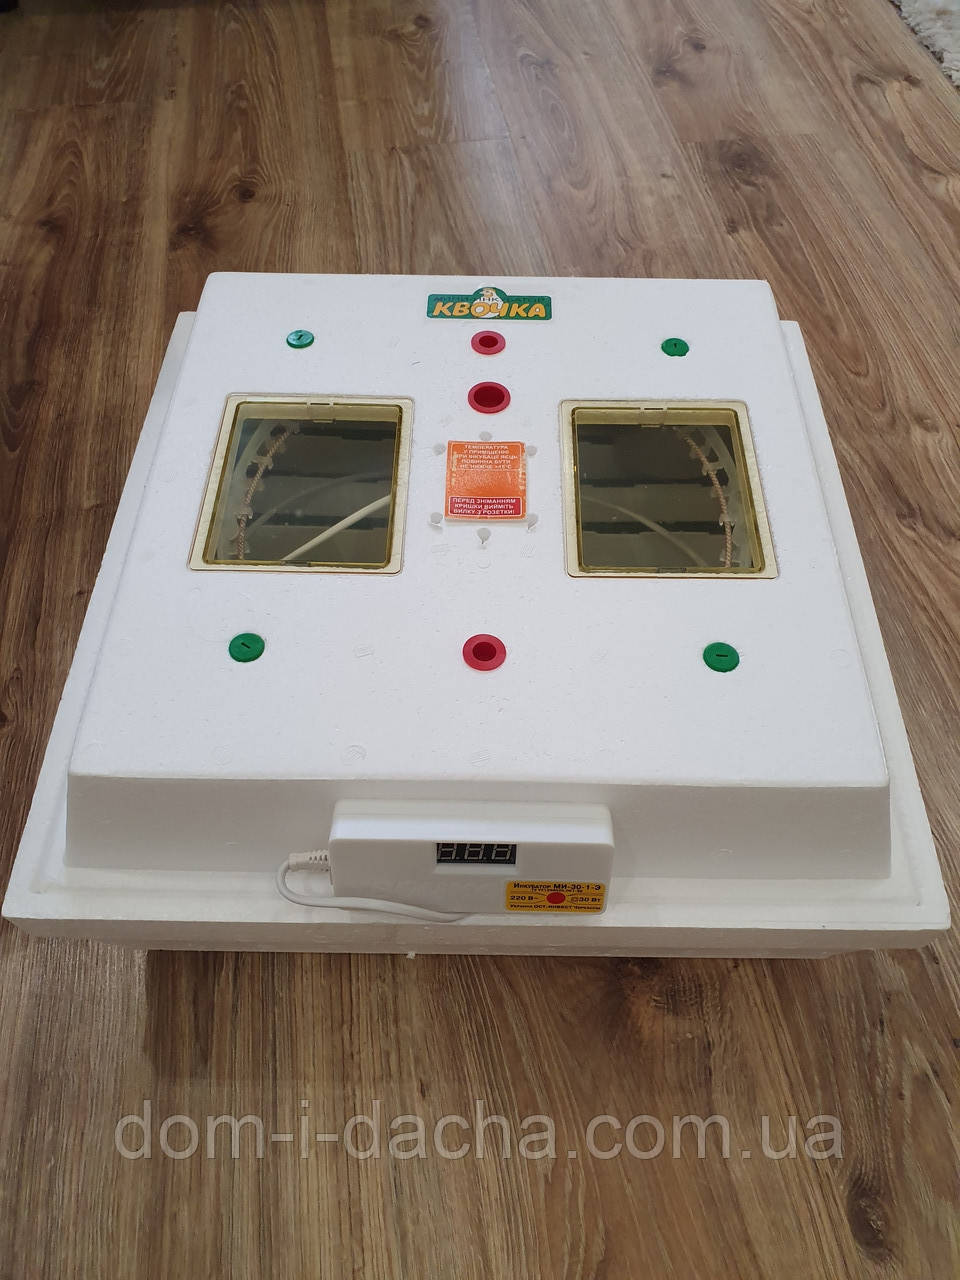 Инкубатор Квочка МИ-30-1-Э (тэн)